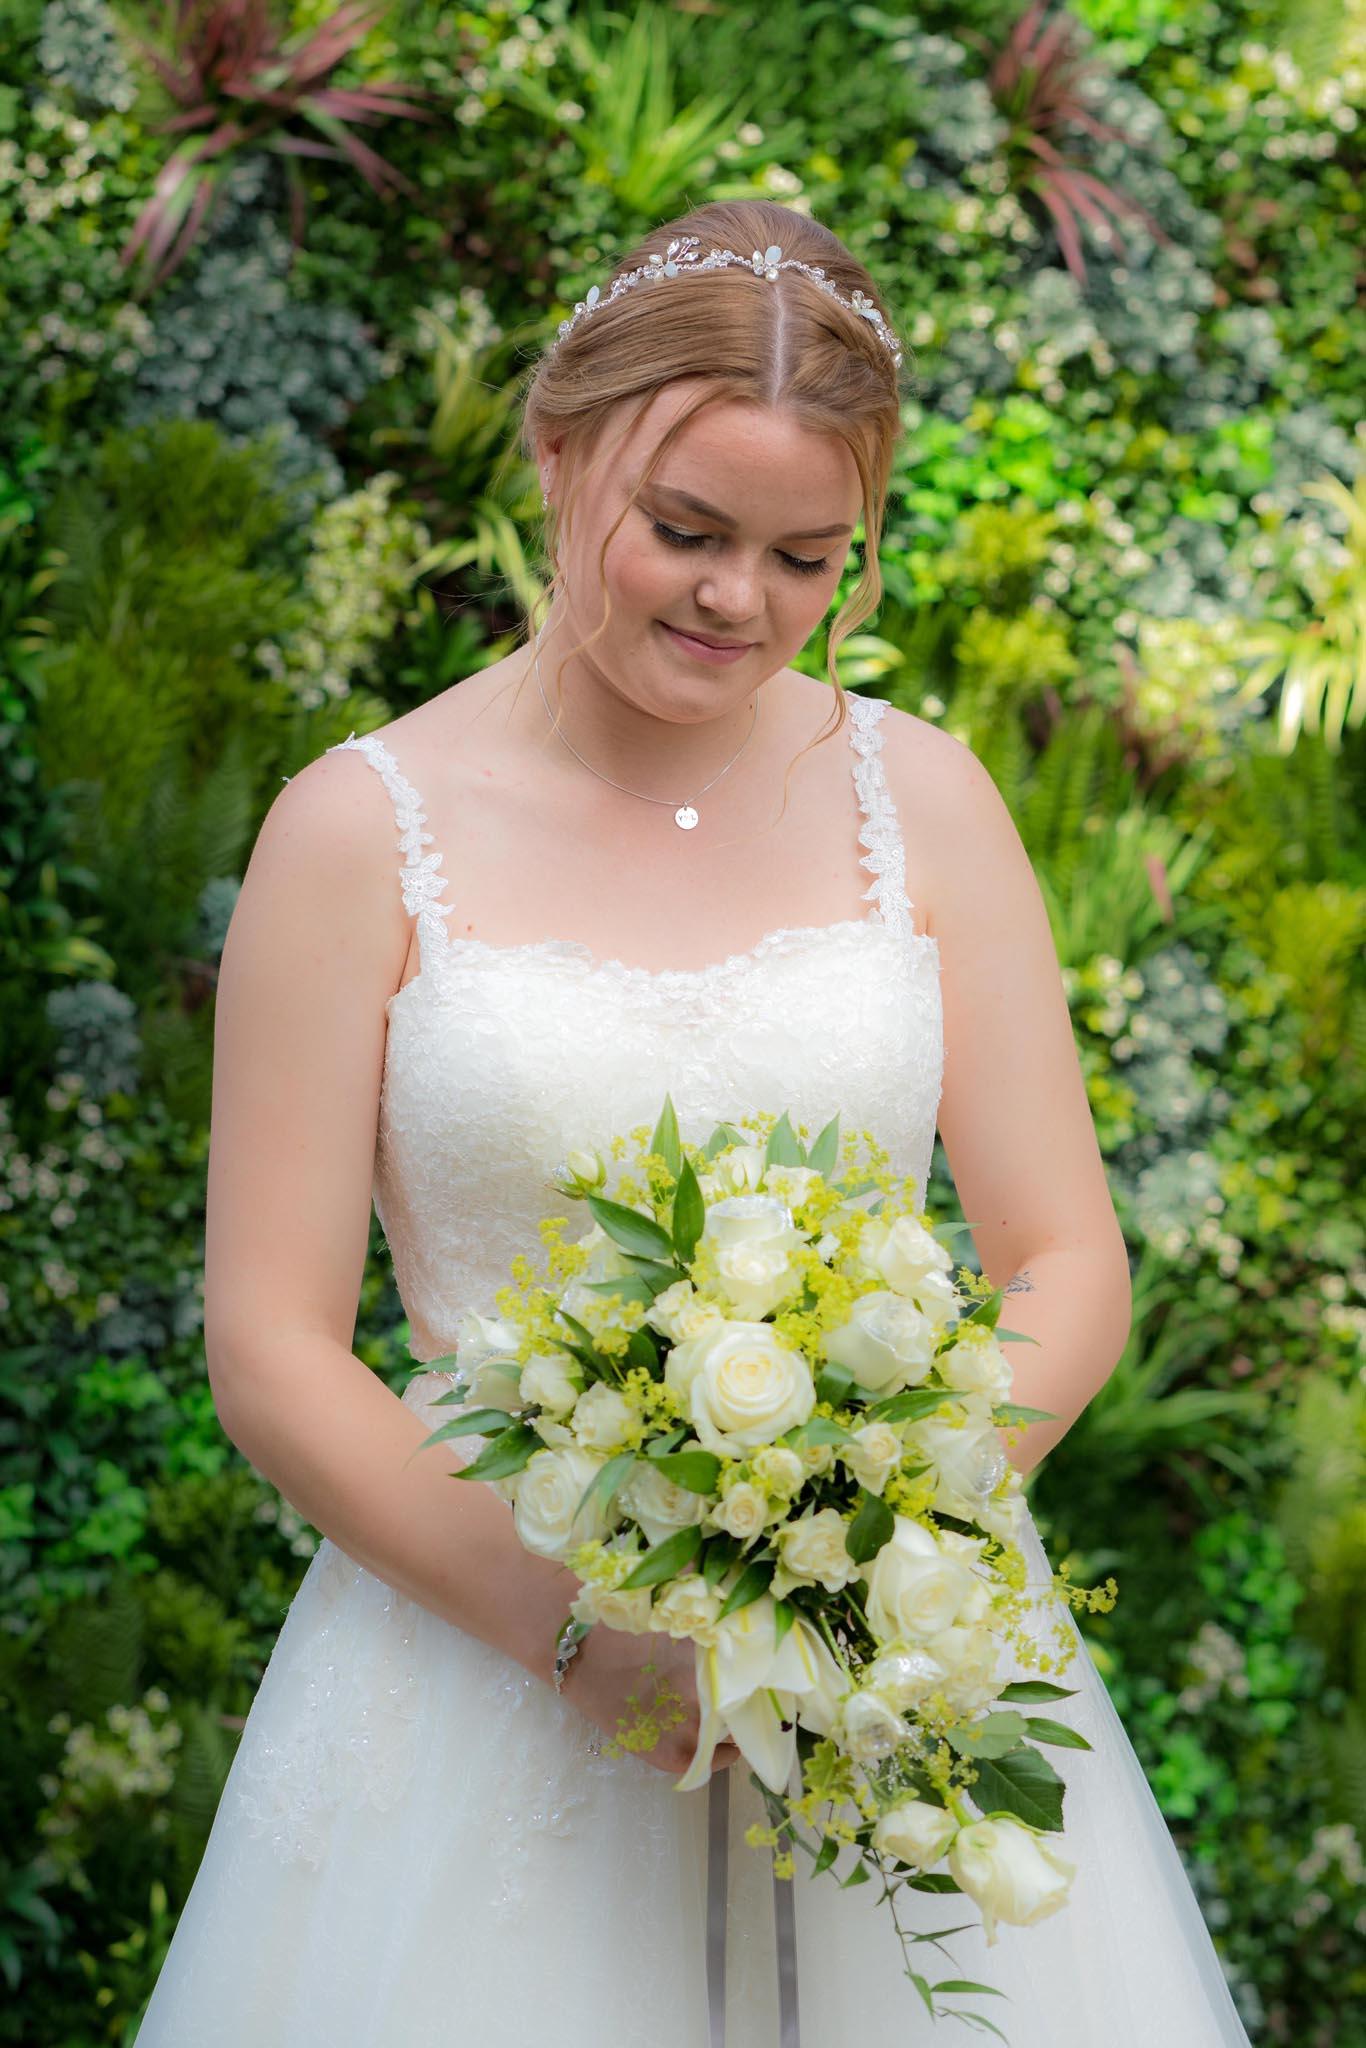 060-Preparations-Luke-Yasmin-The-Rayleigh-Club-Wedding-Photography.jpg